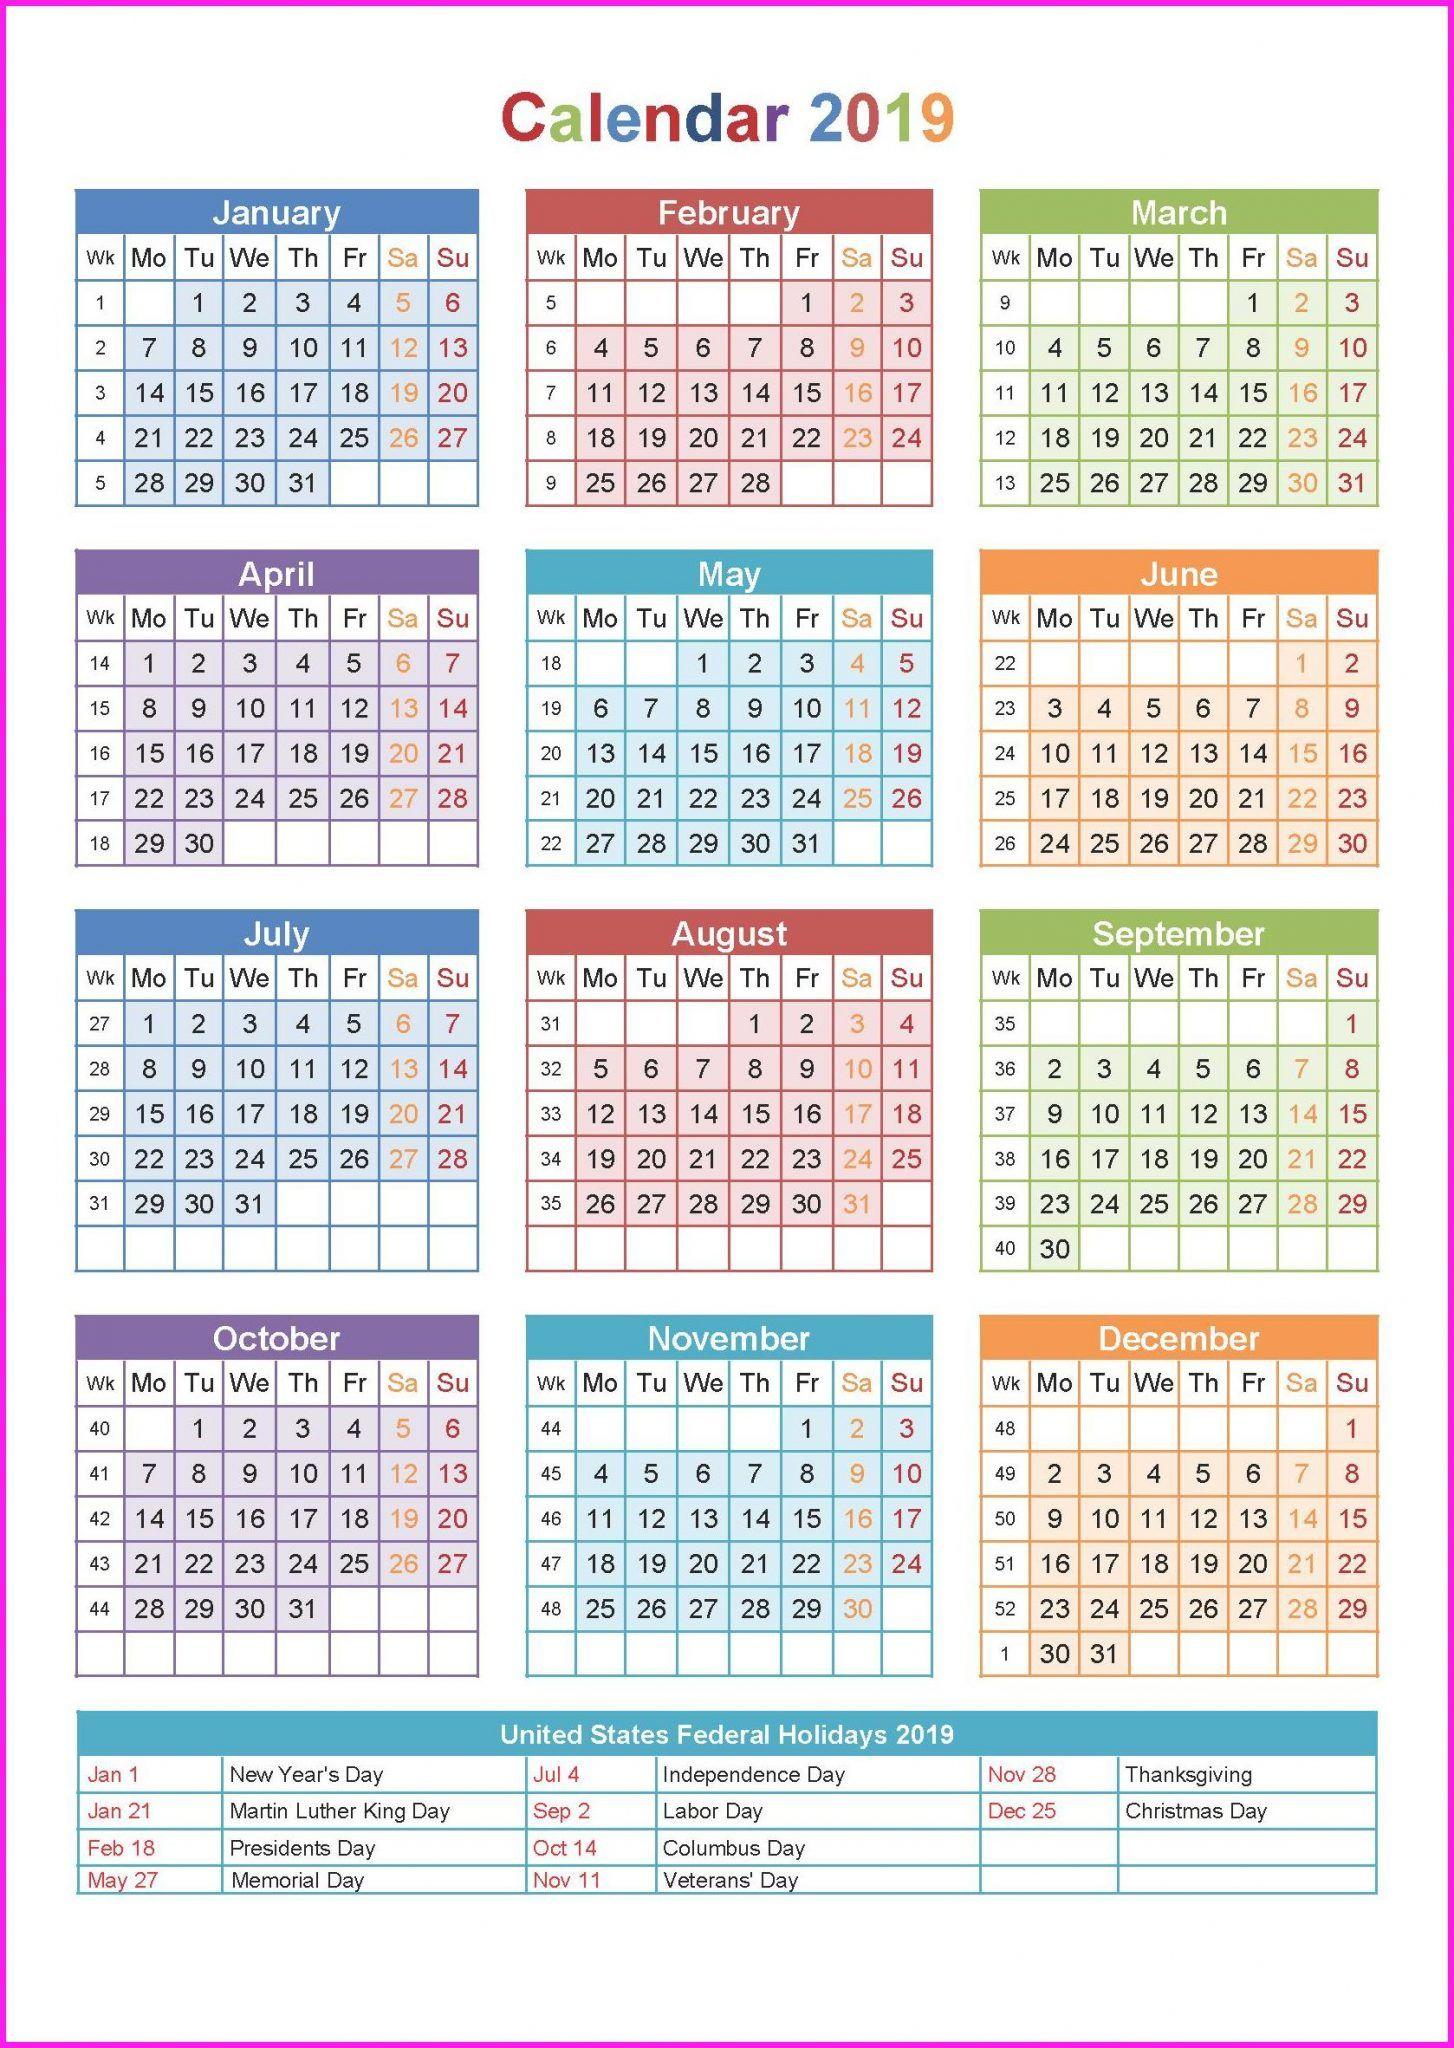 Yearly 2019 Calendar Printable | Top 10 Free 2019 Calendar Printable pertaining to Calendar Blank Planner Months 18 School Year